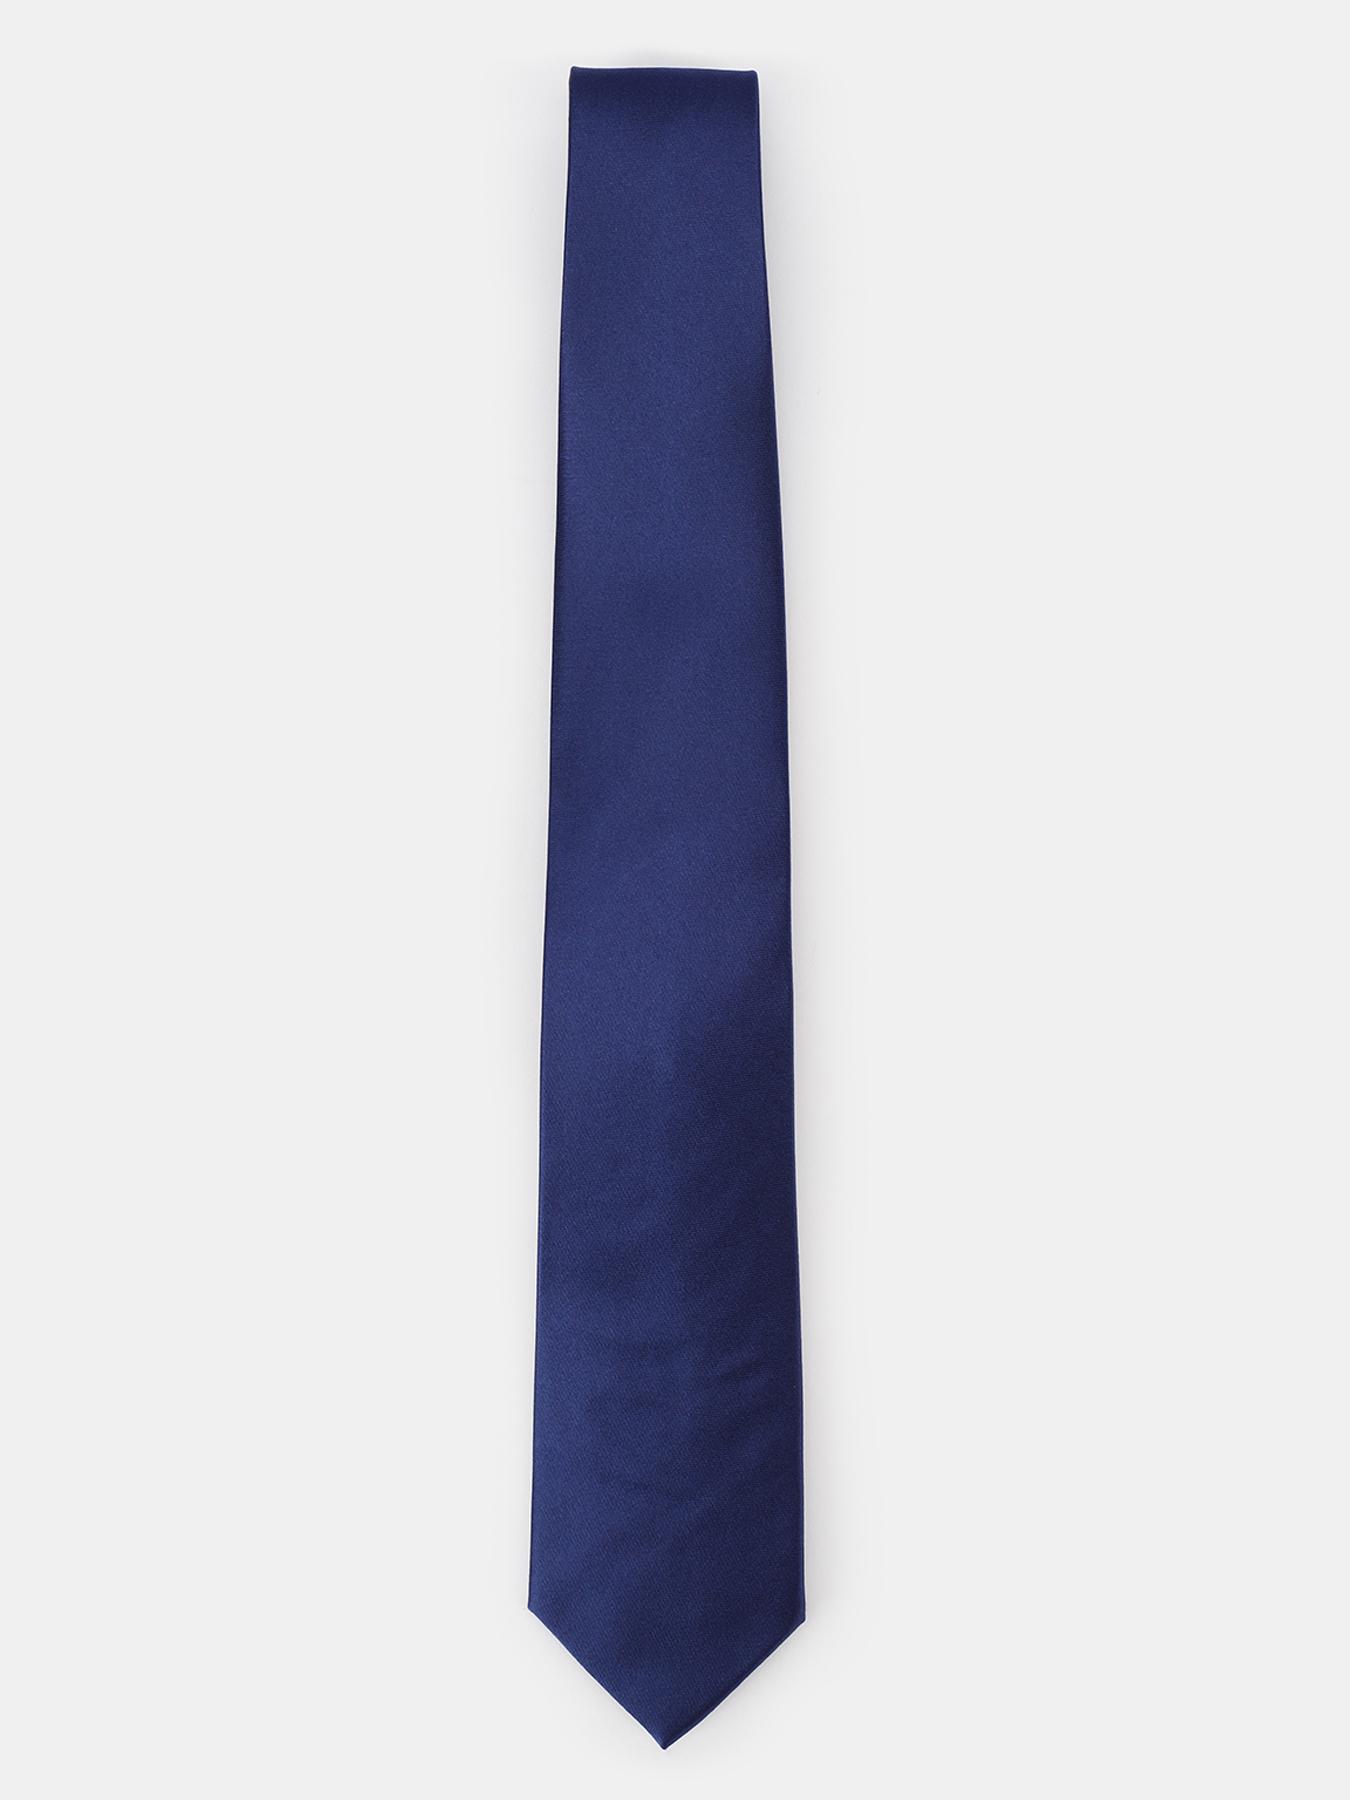 Галстуки Ritter Шелковый галстук галстук ritter шелковый галстук